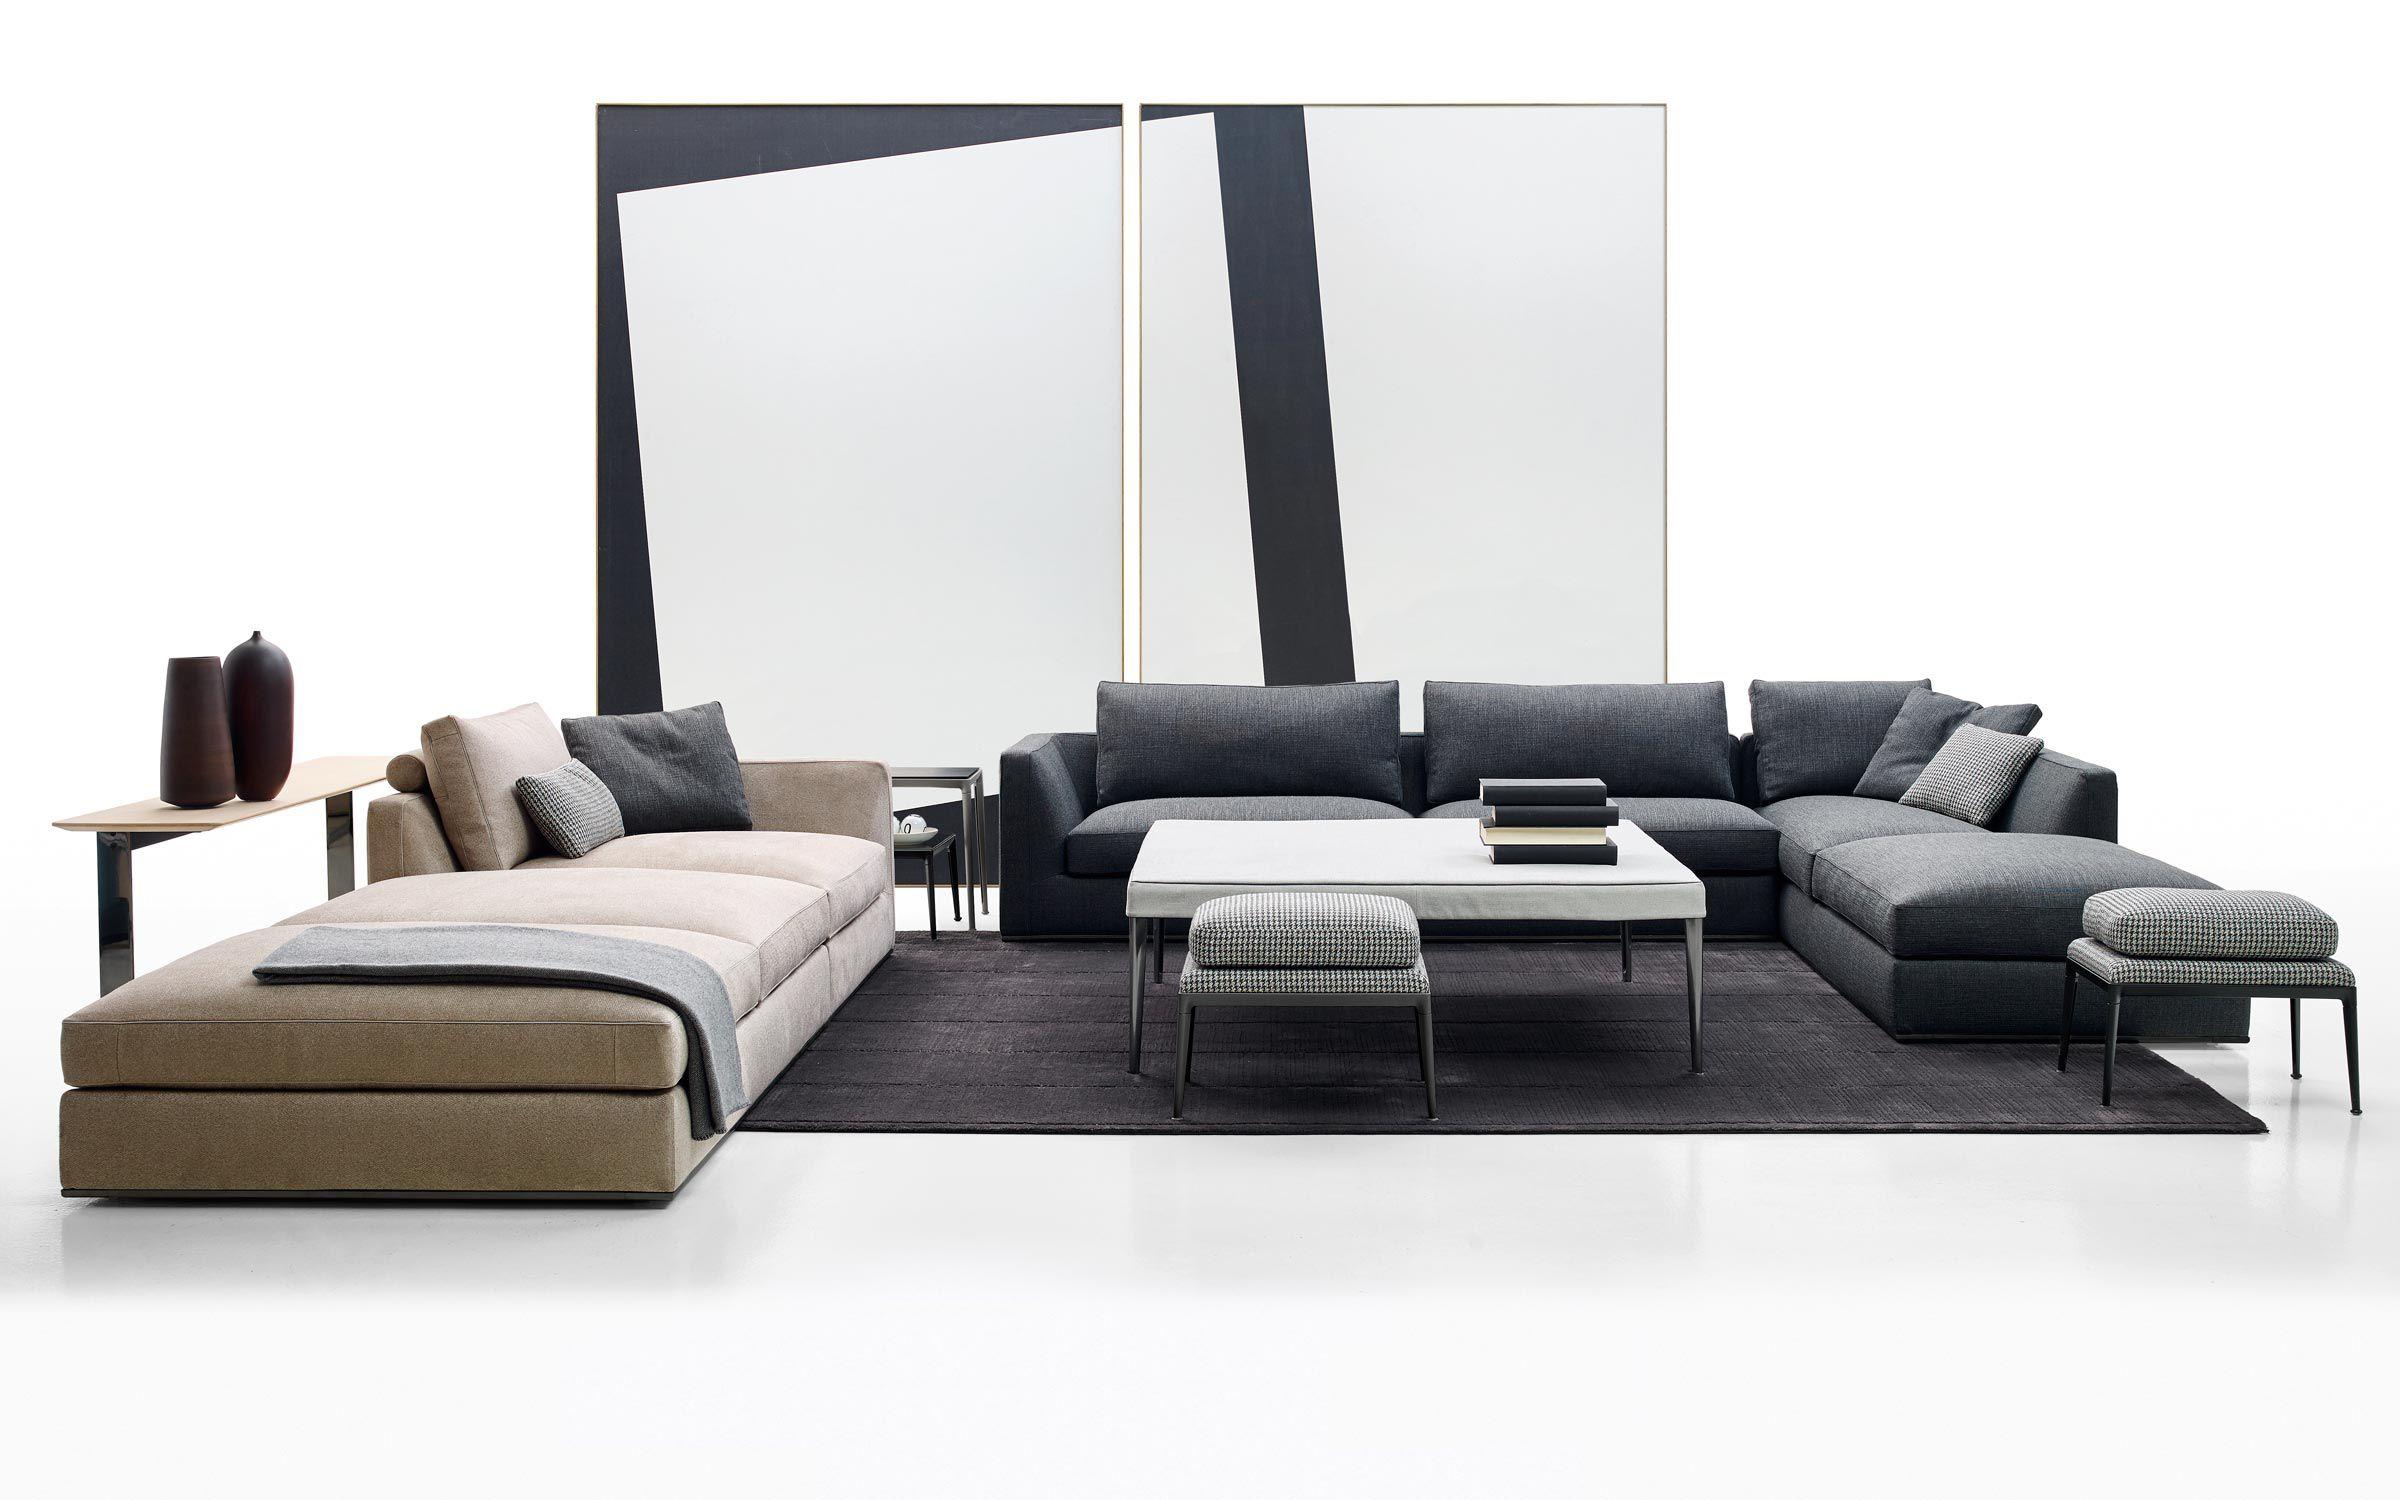 Modular sofa contemporary leather fabric RICHARD B&B Italia